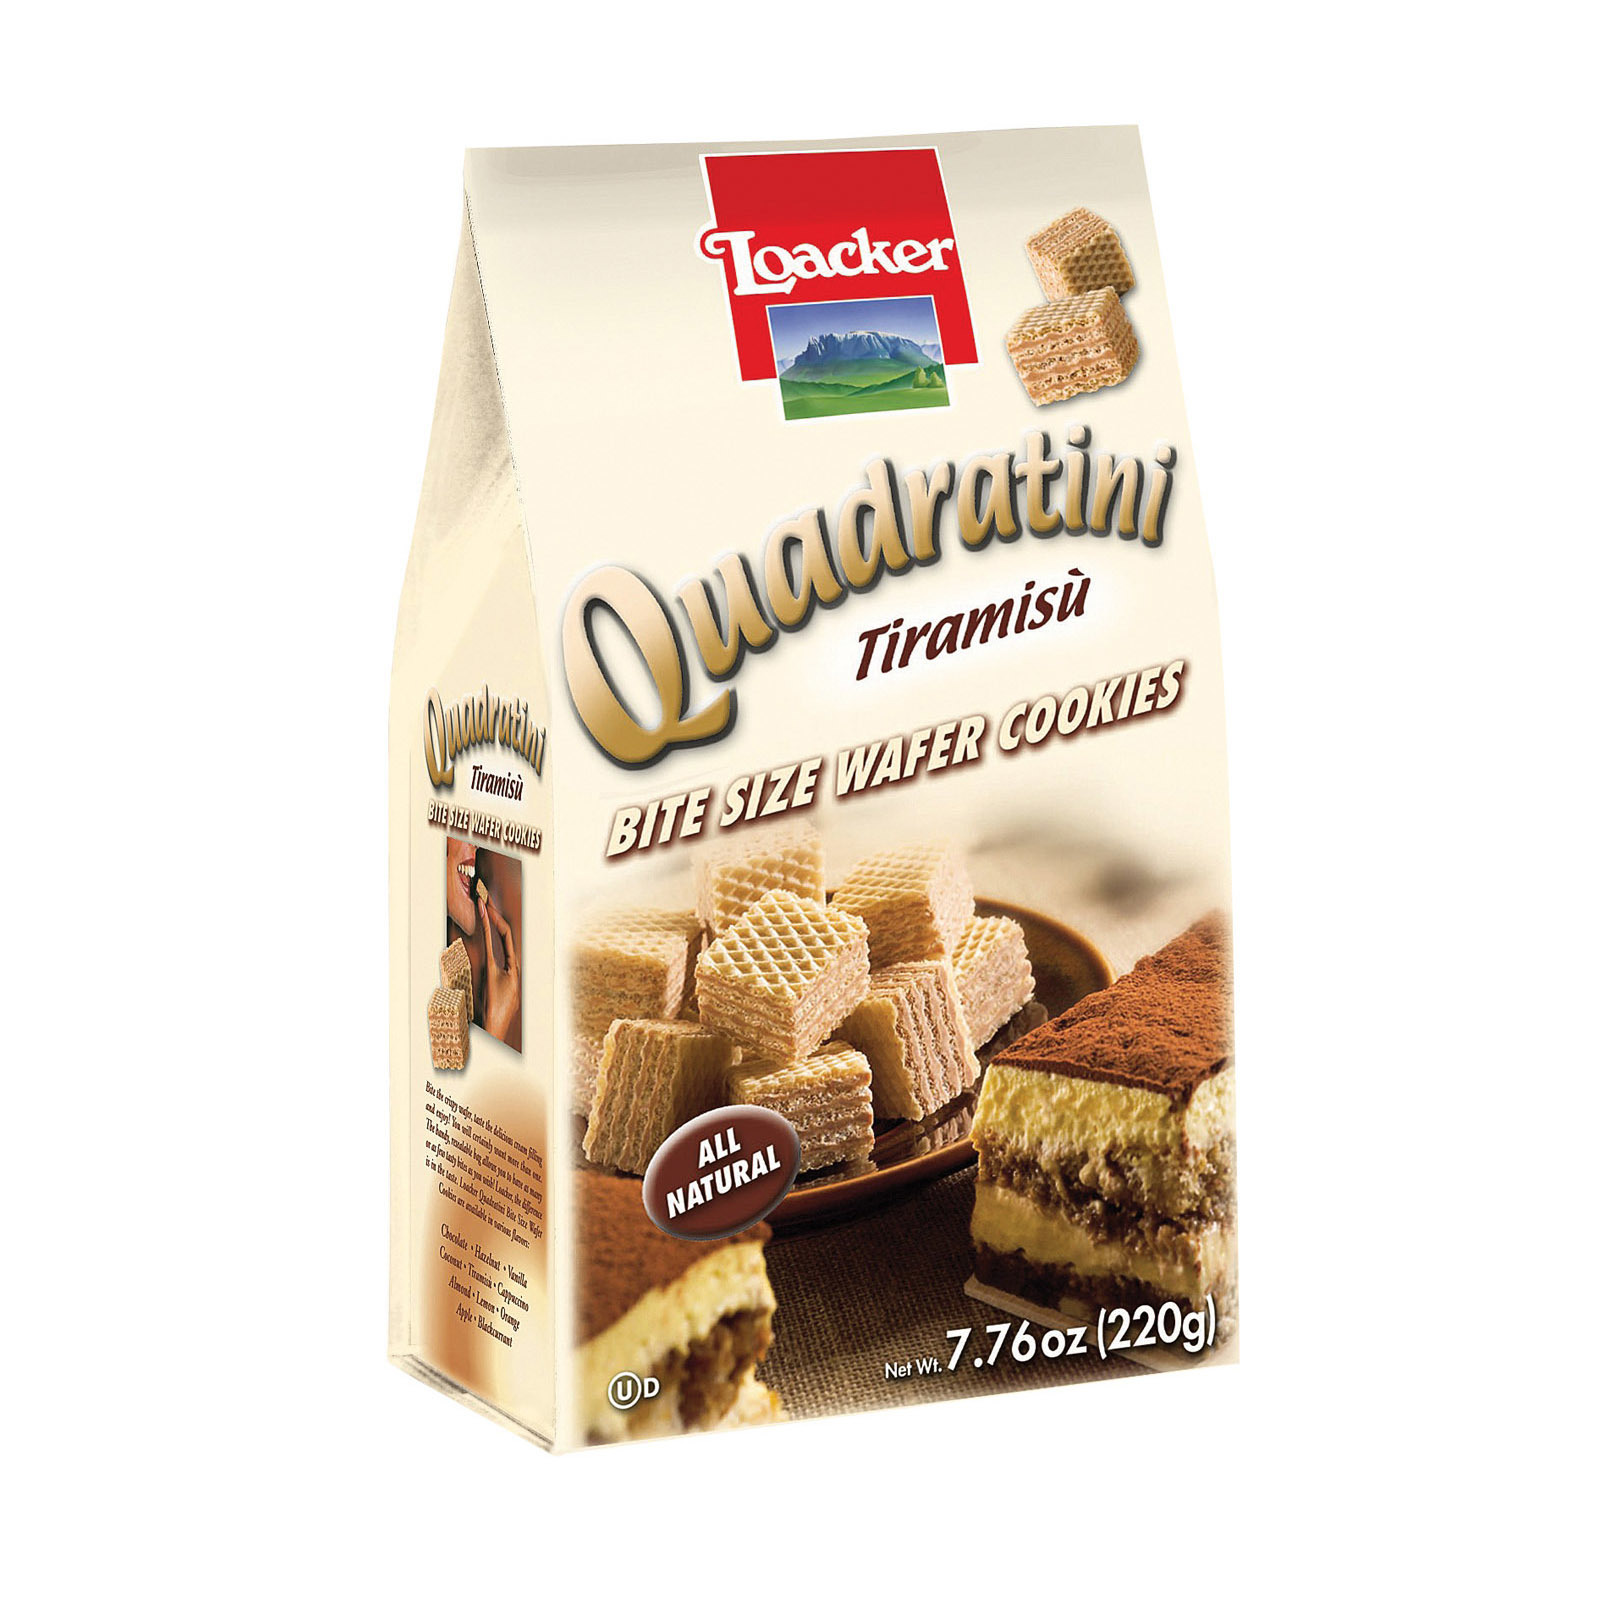 Loacker Quadratini Tiramisu Chocolate Bite Size Wafer Cookies - Case of 8 - 7.76 oz.